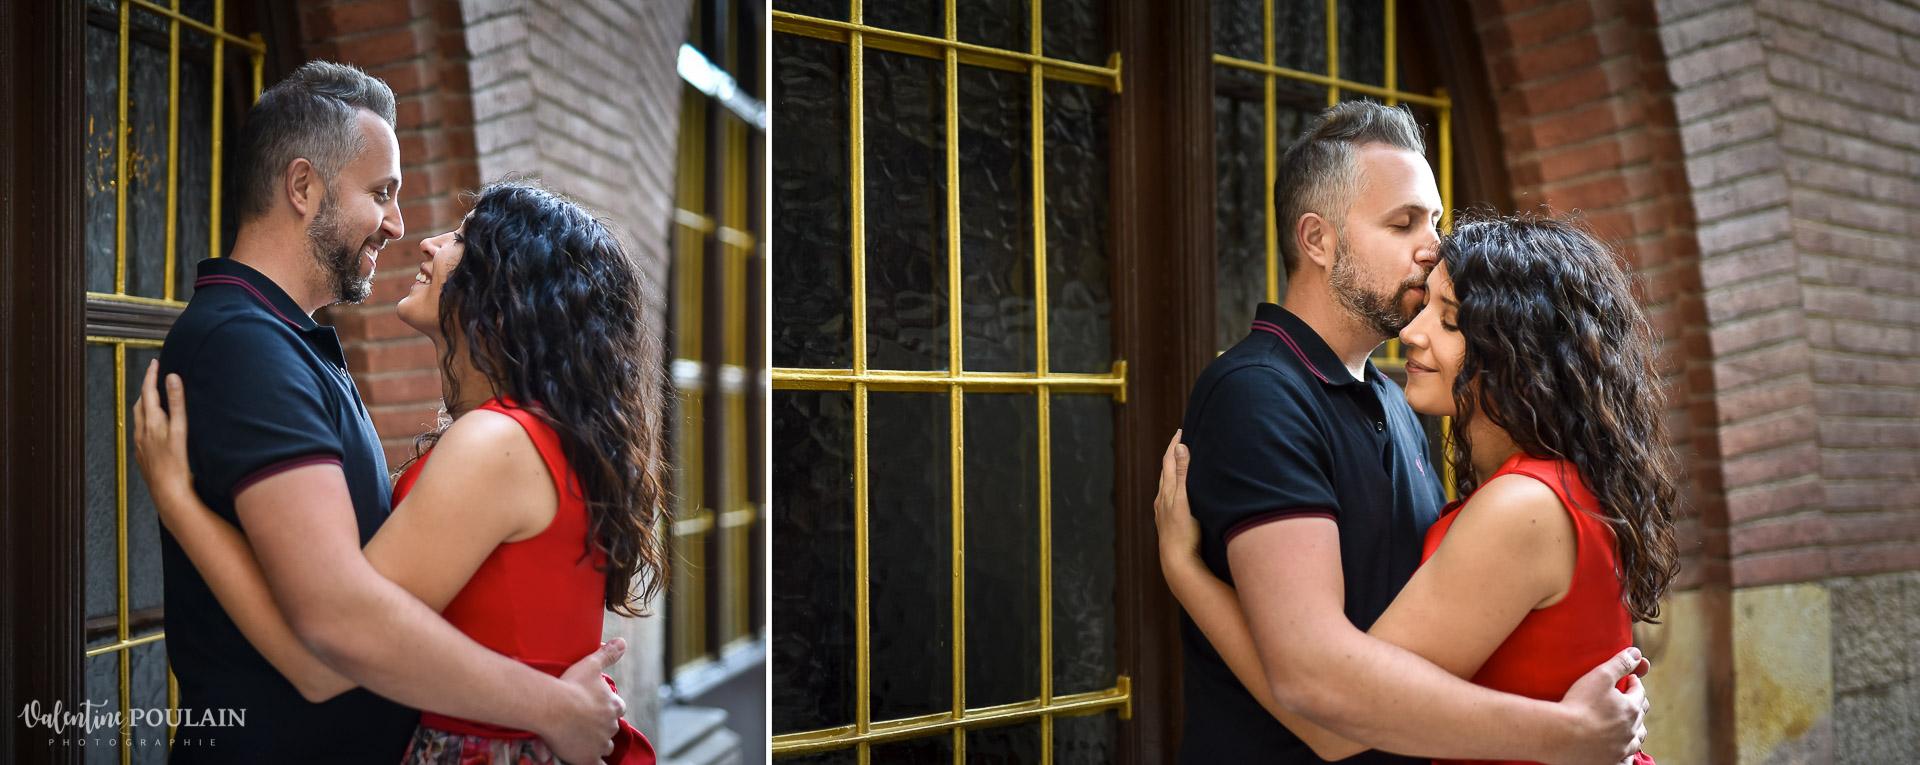 Seance photo couple Barcelone - Valentine Poulain love